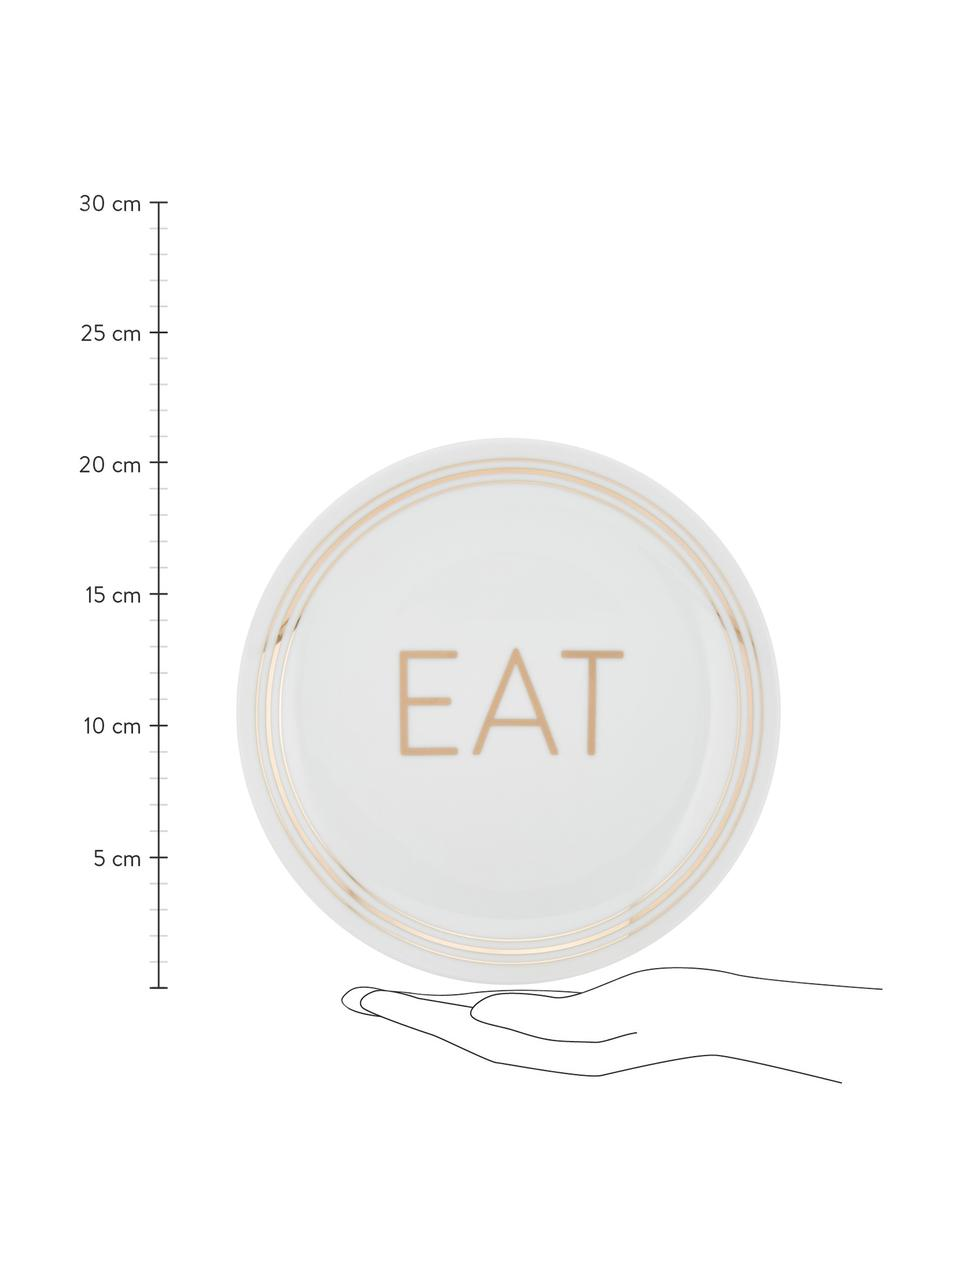 Porzellan Frühstücksteller Glimmer mit goldener Aufschrift, 4er-Set, Porzellan, Weiß, Goldfarben, Ø 21 cm